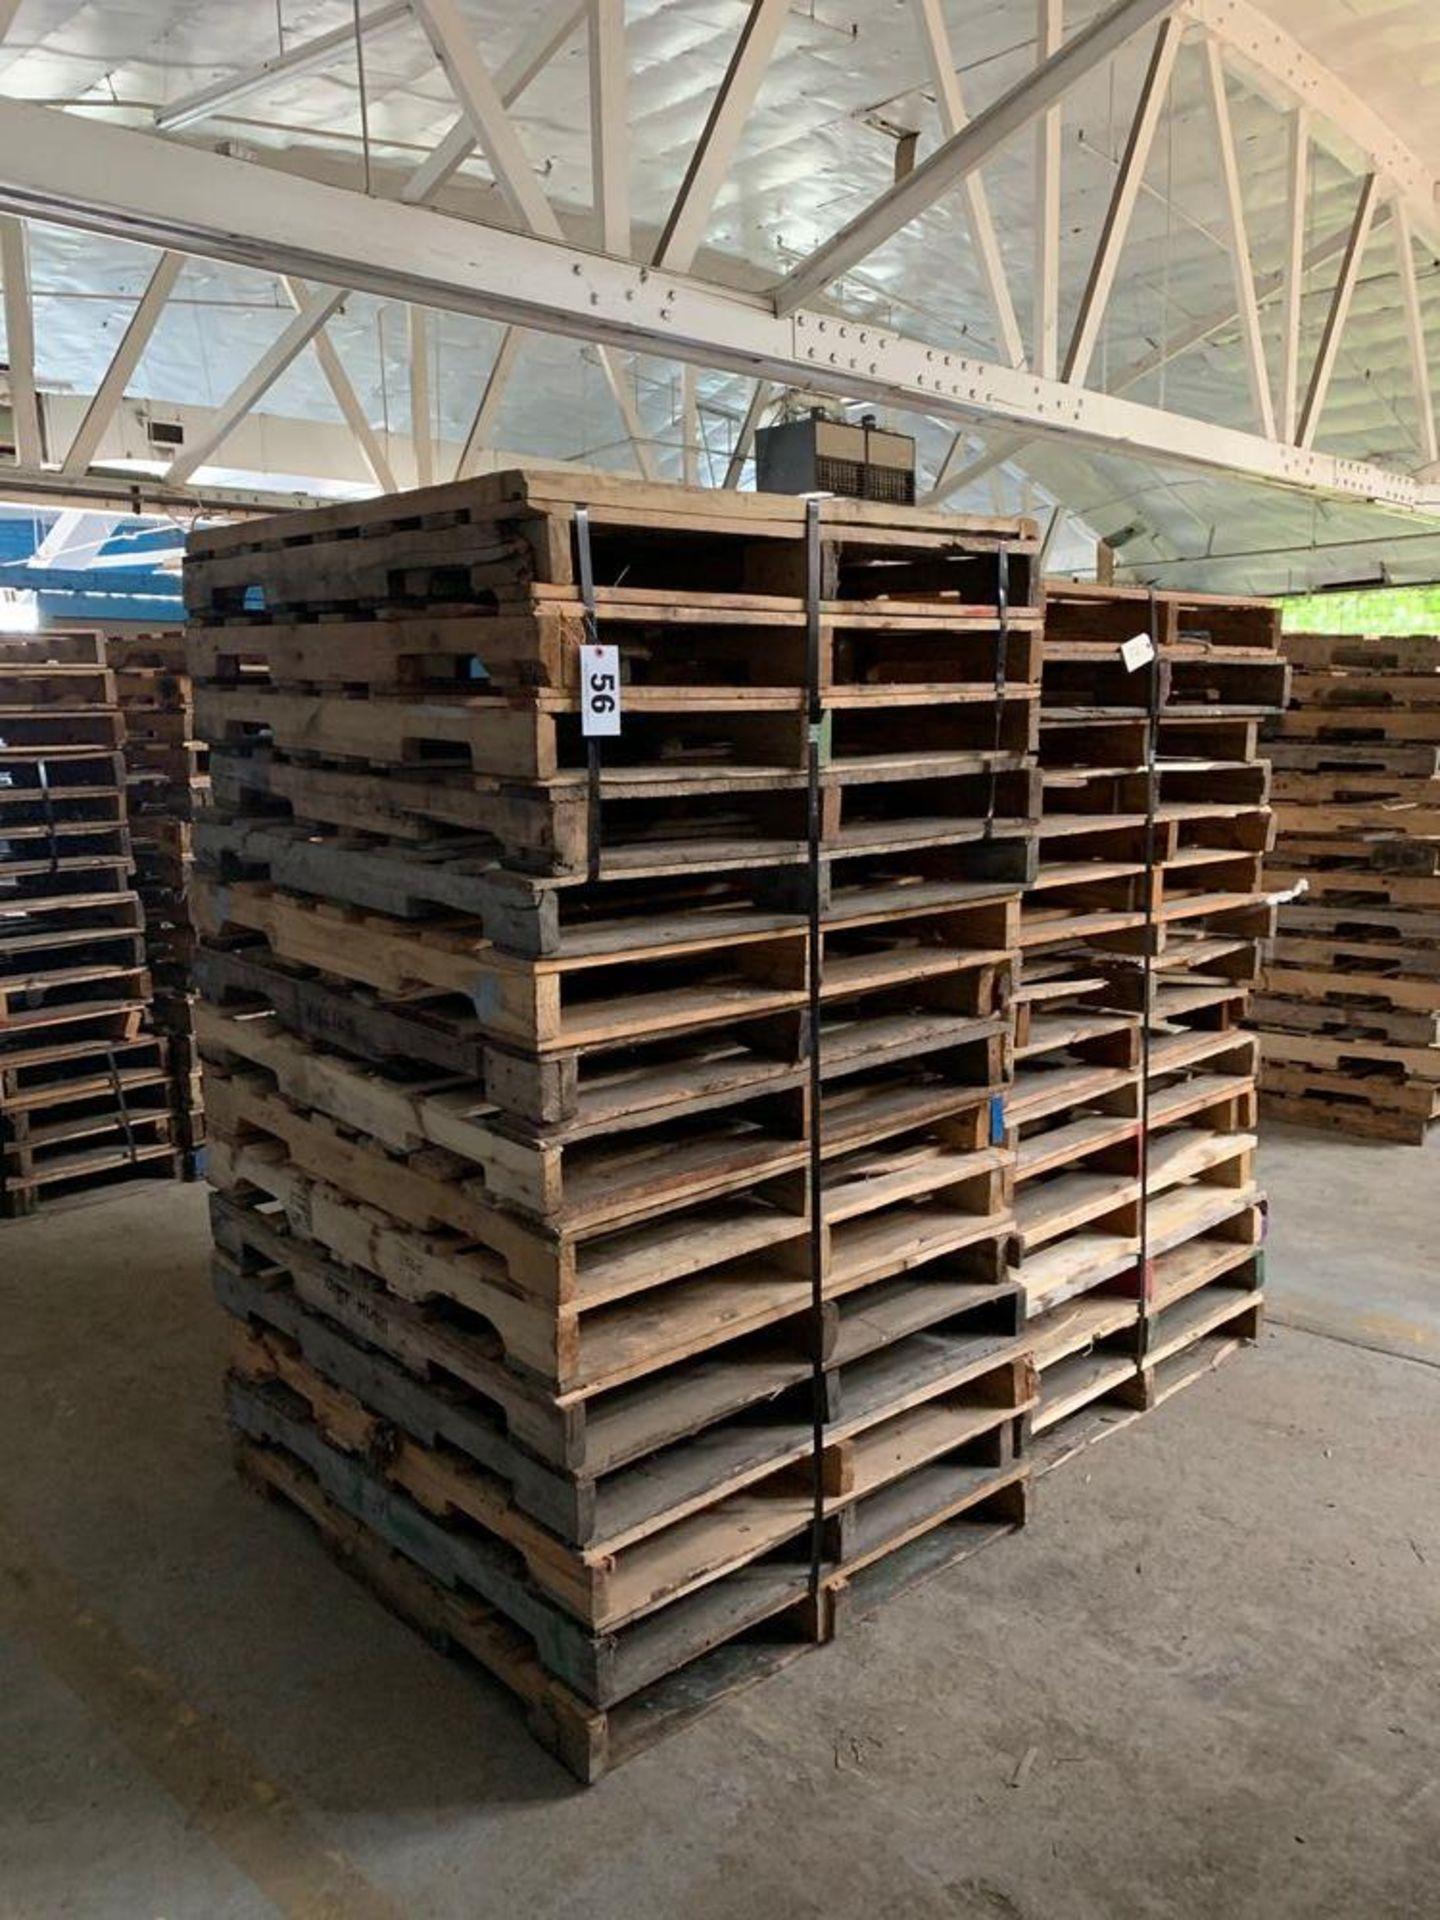 Lot 56 - Lot of Skids (2 stacks)